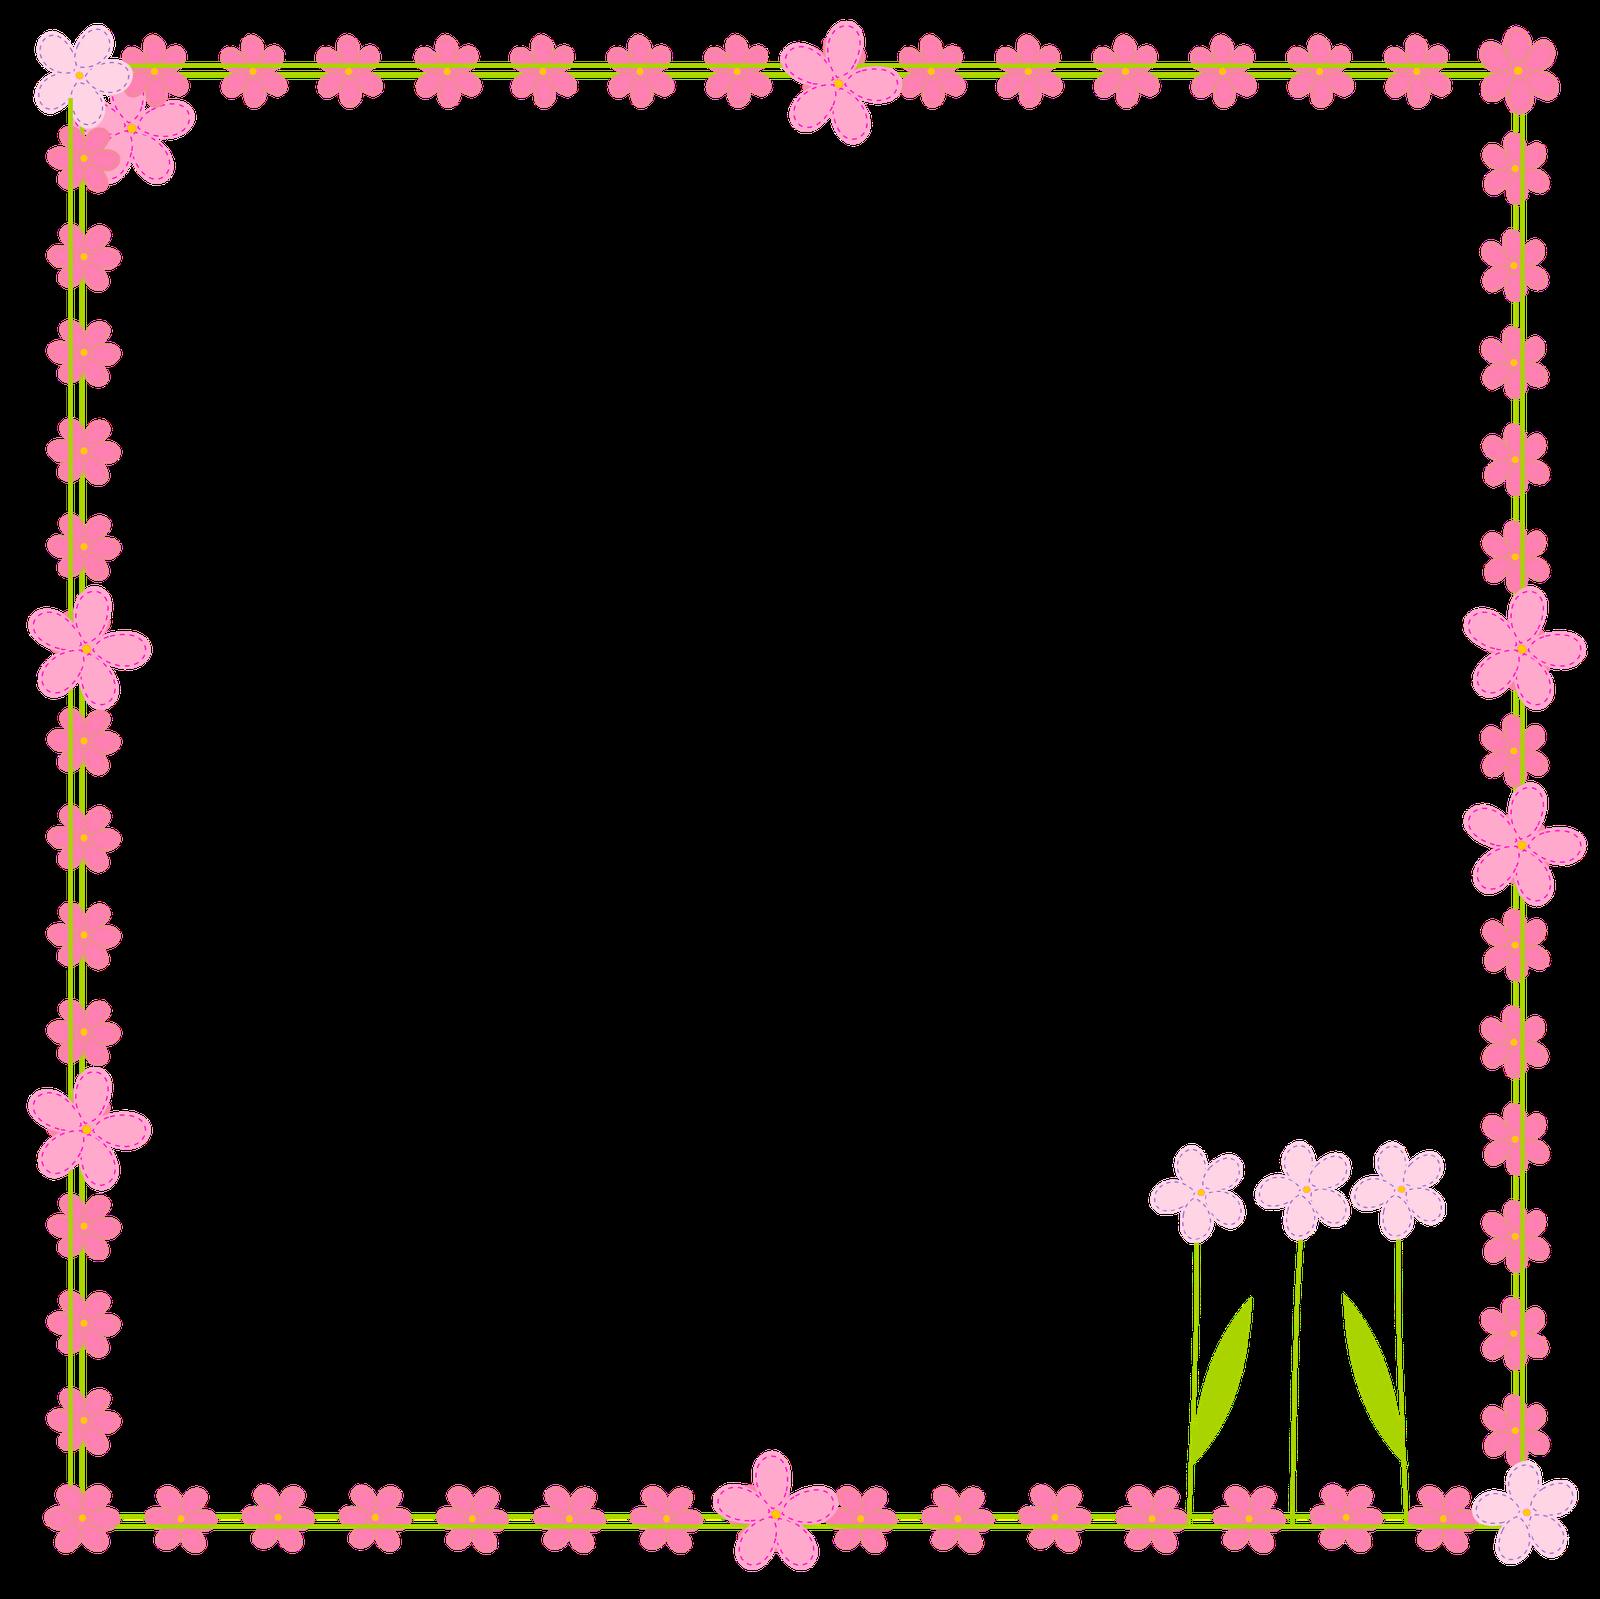 Free digital flower border. Scrapbook clipart spring